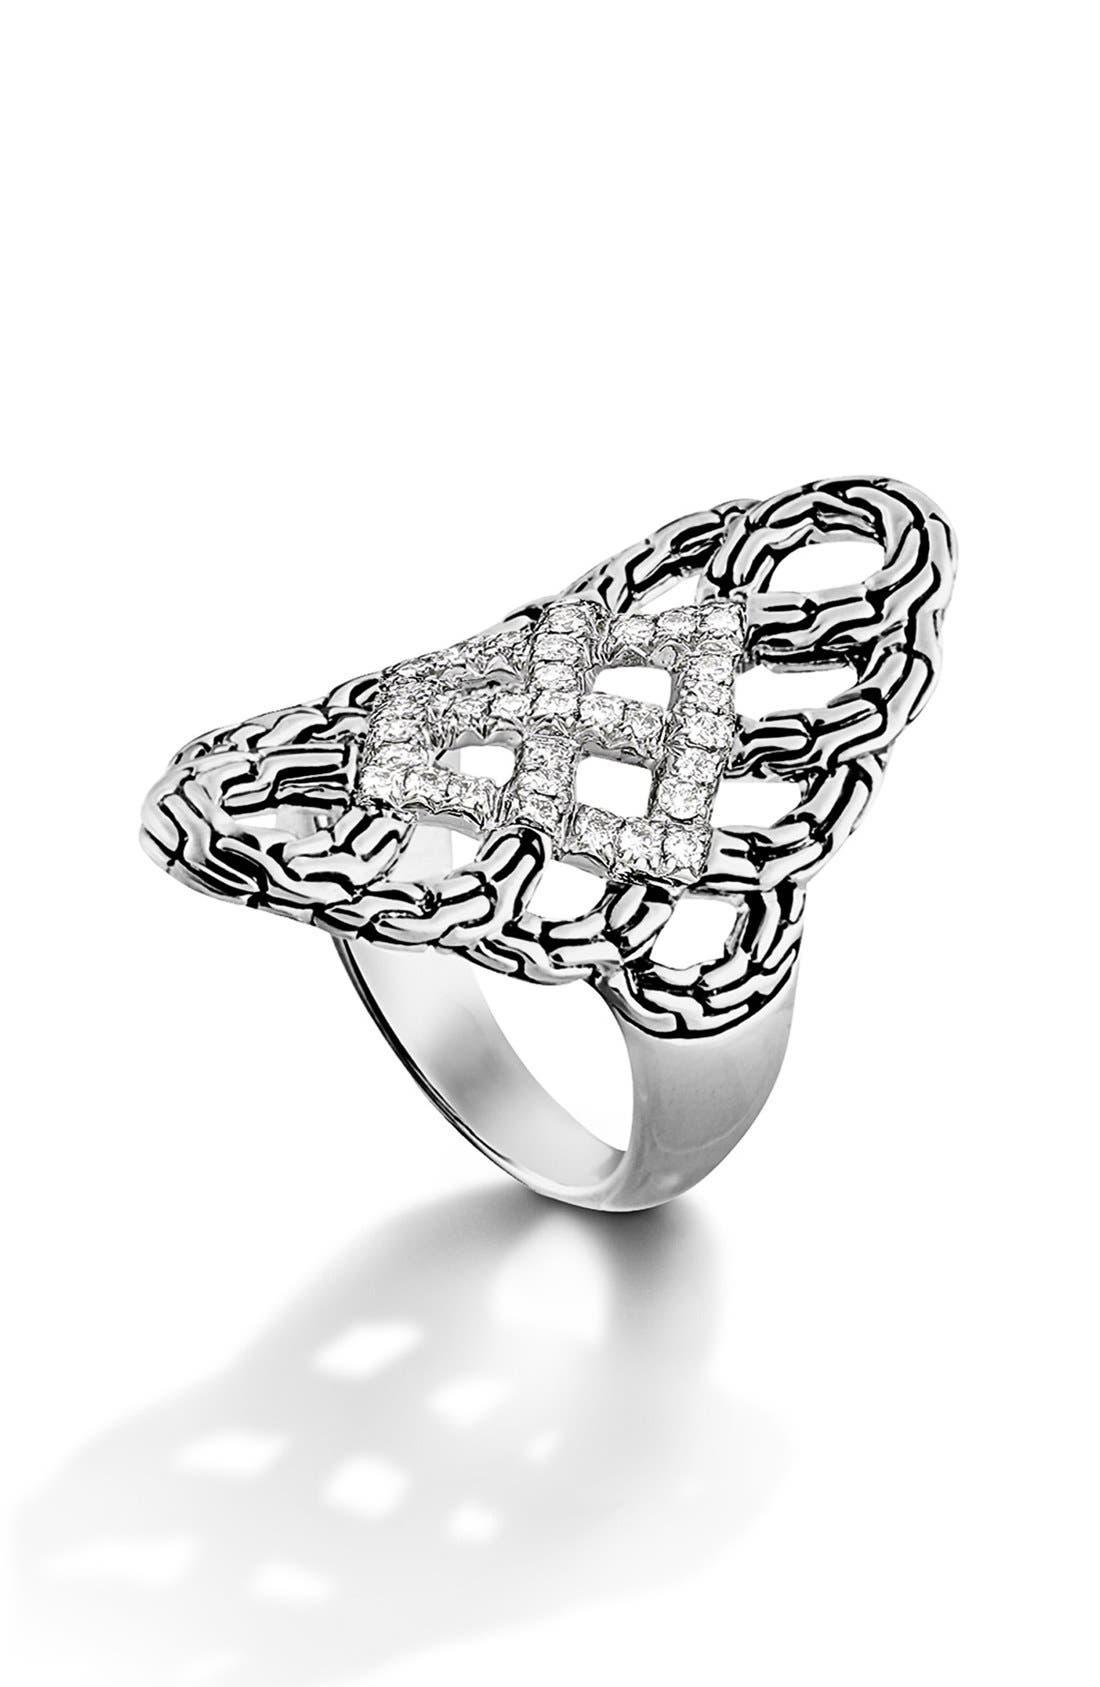 Main Image - John Hardy 'Classic Chain' Diamond Saddle Ring